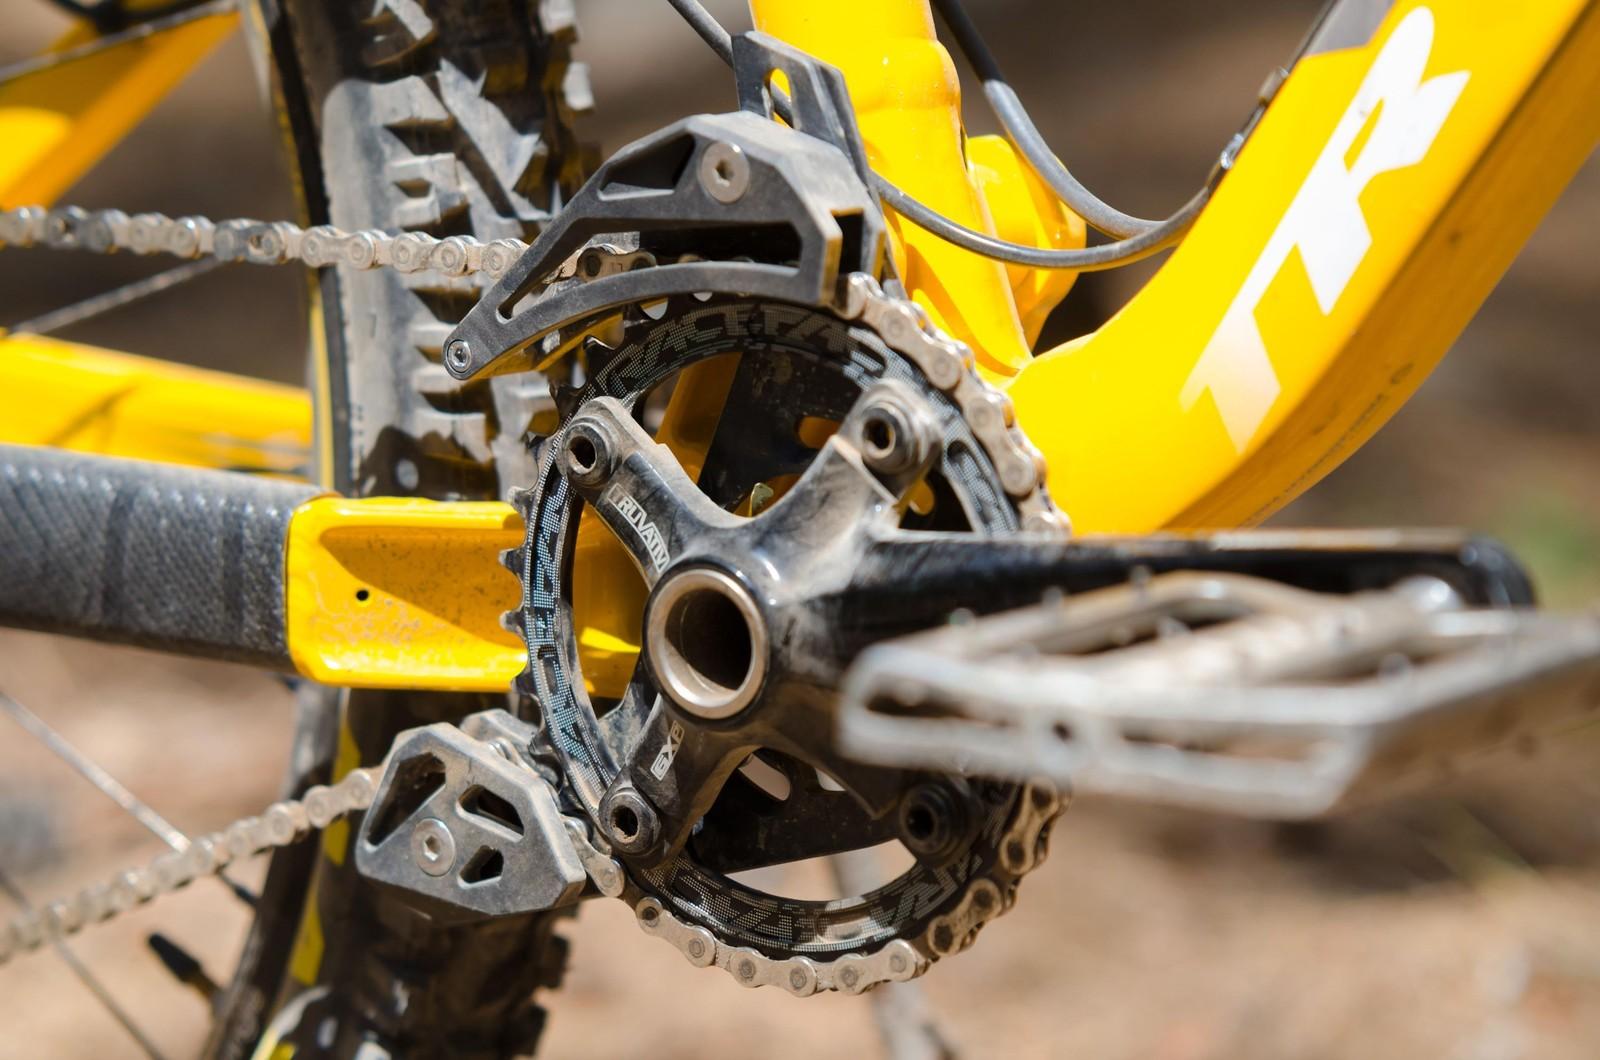 2013 Nukeproof Mega TR - Cranks - iceman2058 - Mountain Biking Pictures - Vital MTB